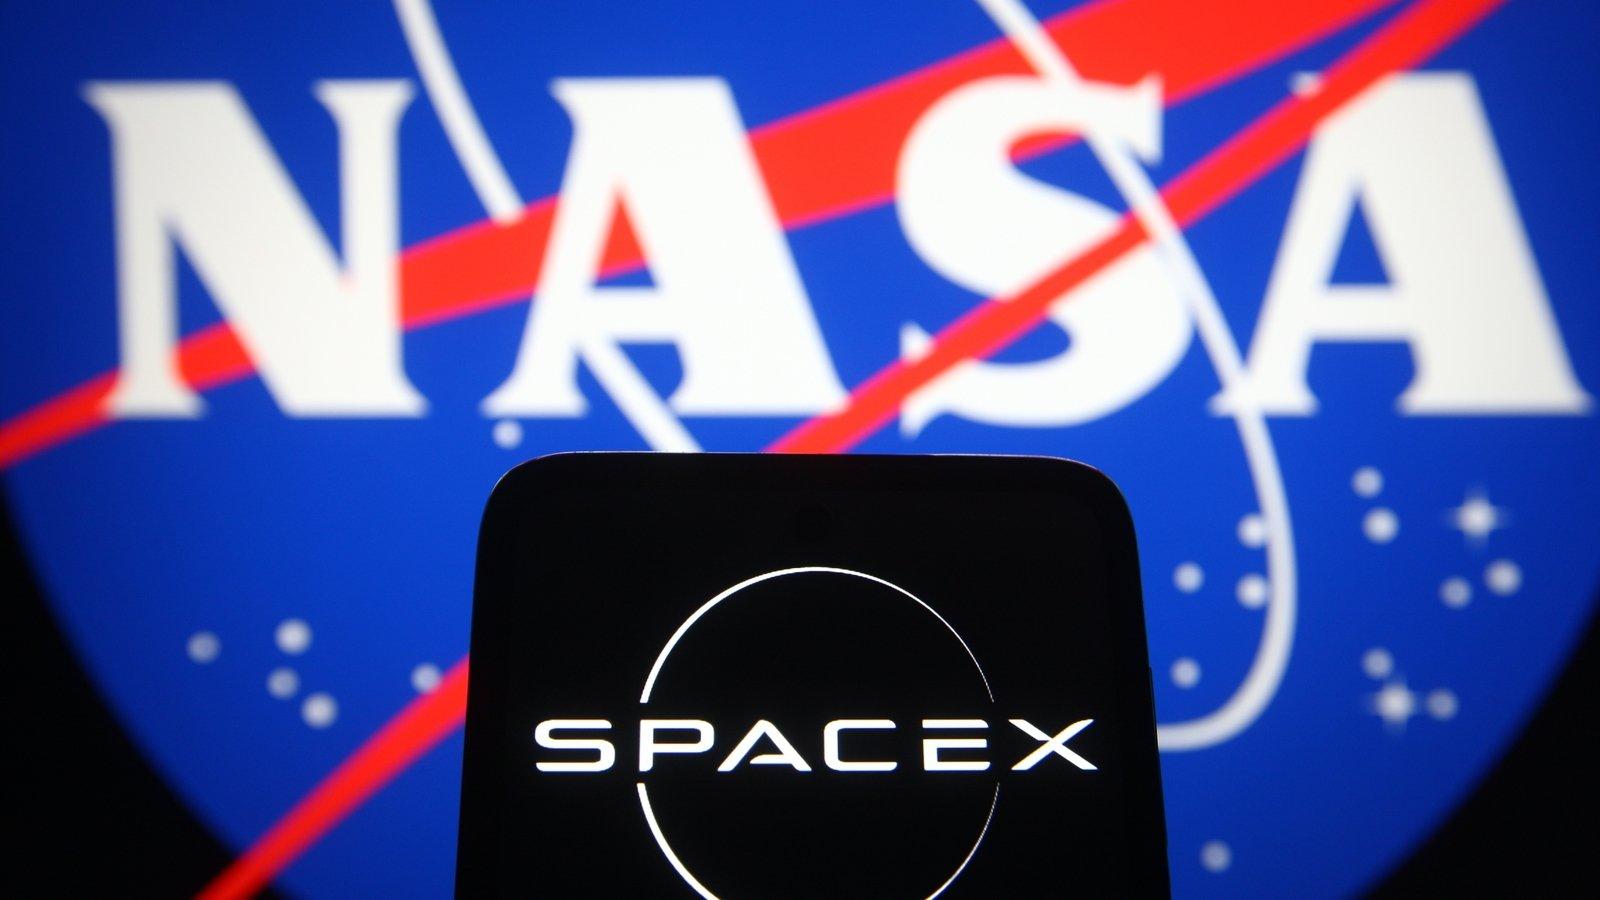 NASA selects SpaceX for mission to Jupiter moon Europa | வியாழனின் சந்திரன் யூரோபாவிற்கான பணிக்காக நாசா ஸ்பேஸ்X ஐ தேர்வு செய்கிறது |_40.1